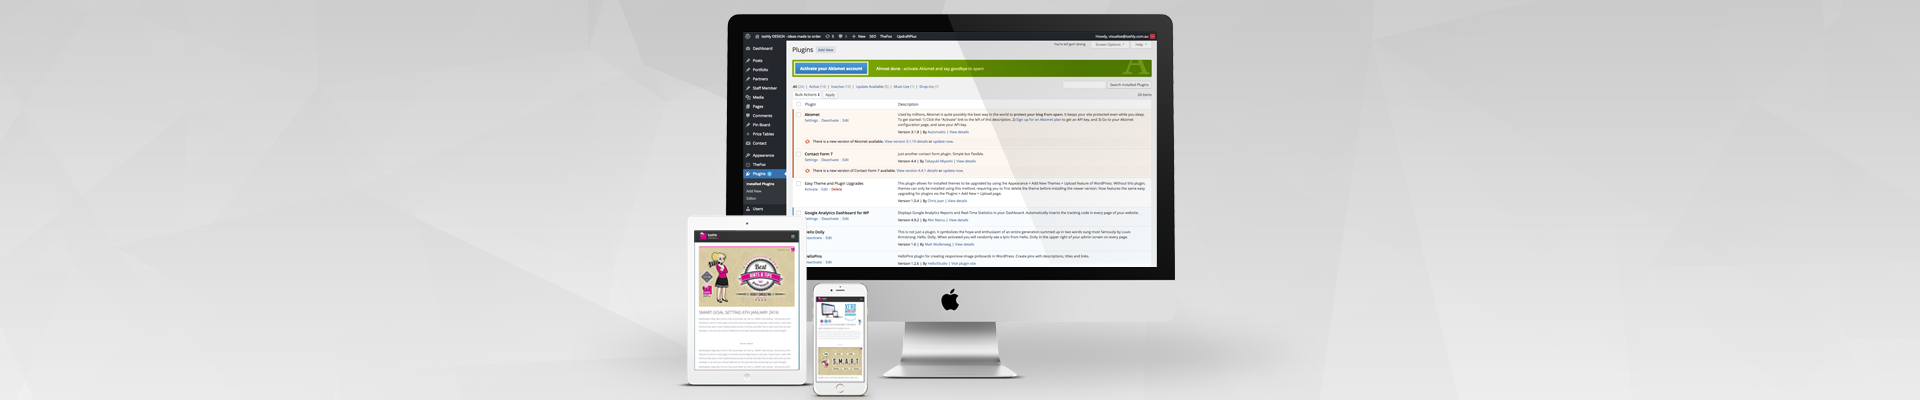 webDesign extras - customise with wordpress plugins